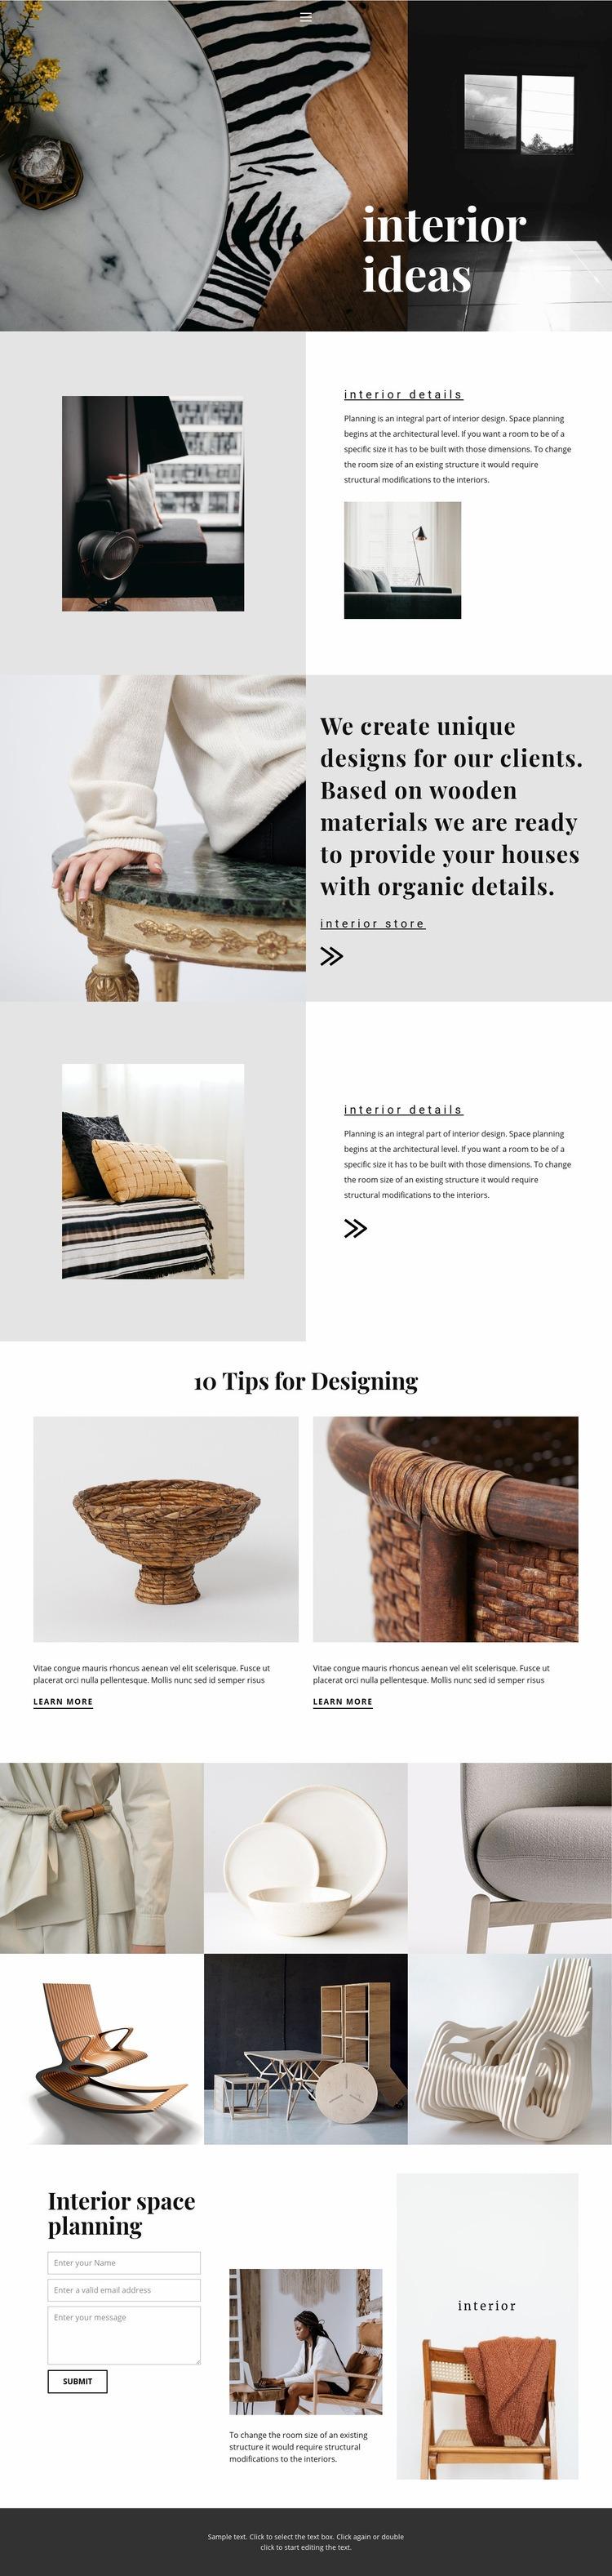 New interior ideas Web Page Designer